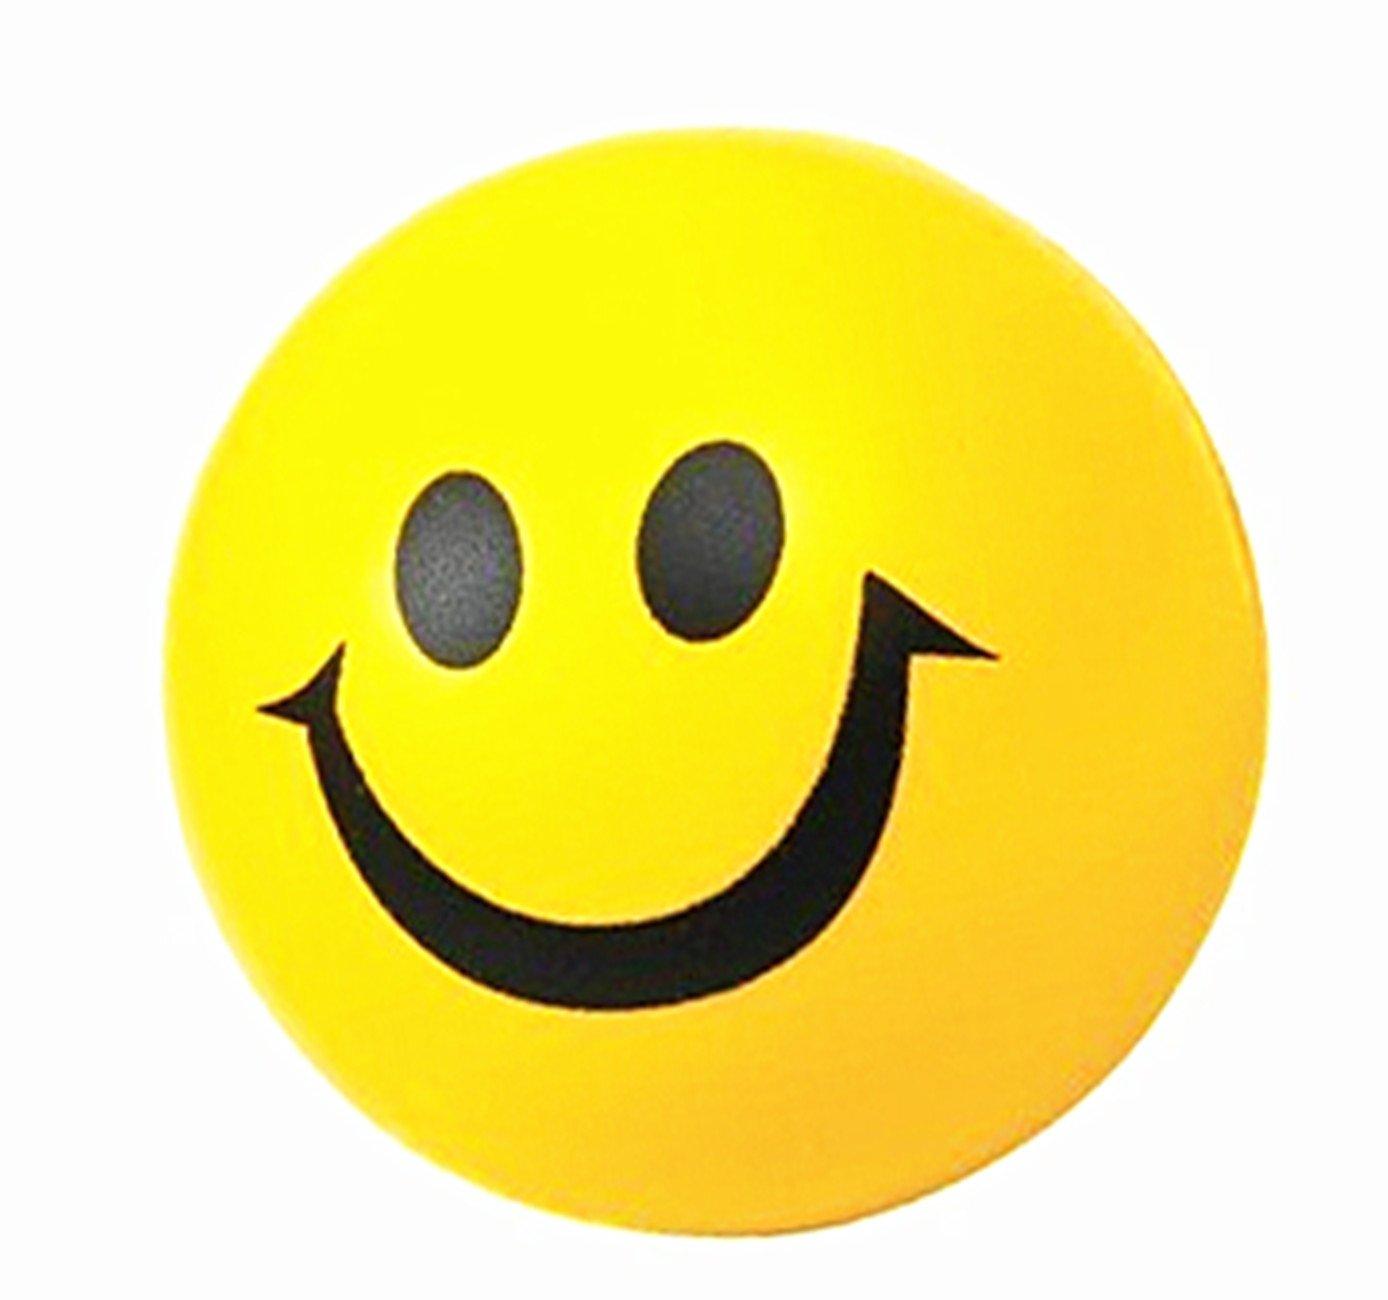 KingWinX Kid 's Smile Faceボール、パックの2個イエロー B00ZX8MDMC